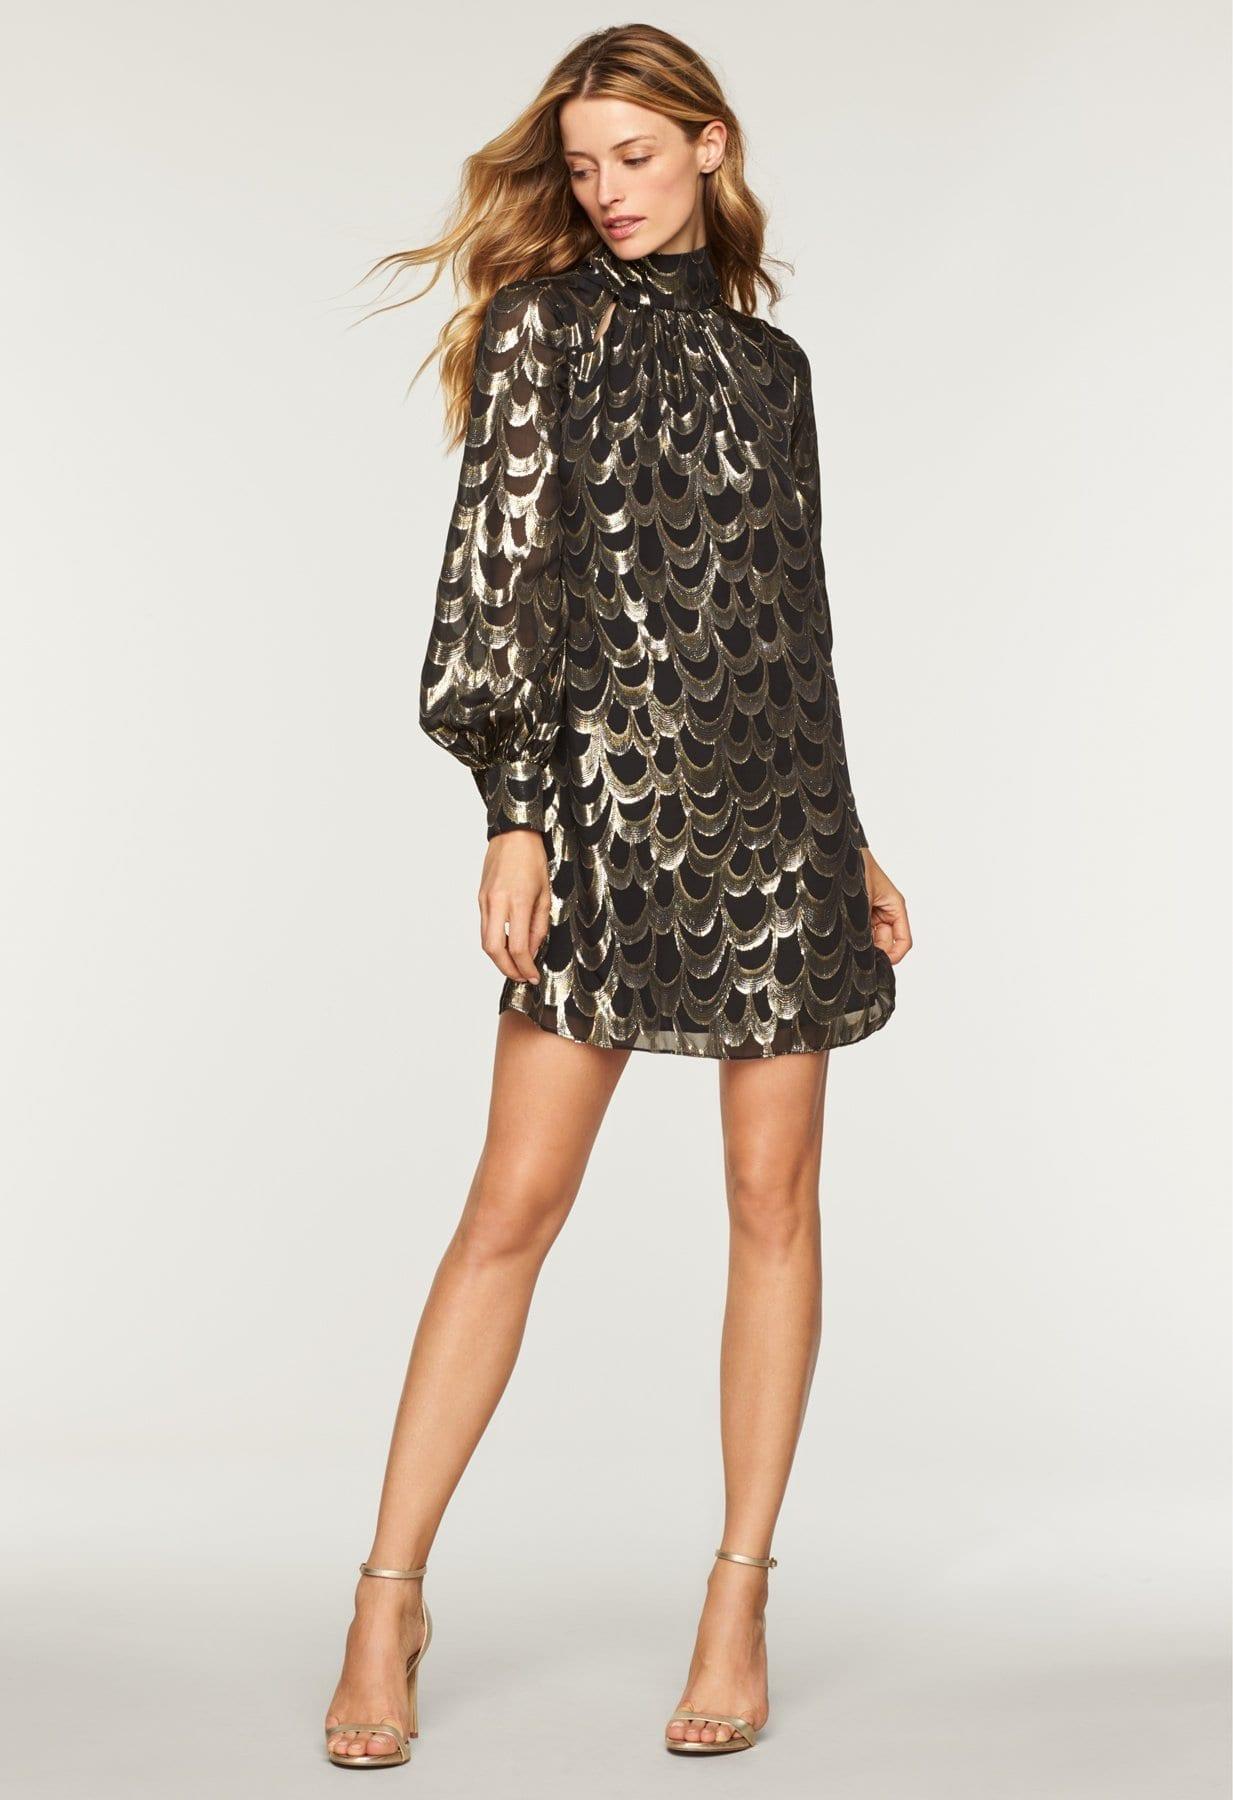 MILLY Silk Lurex Chiffon Sherie Black Dress